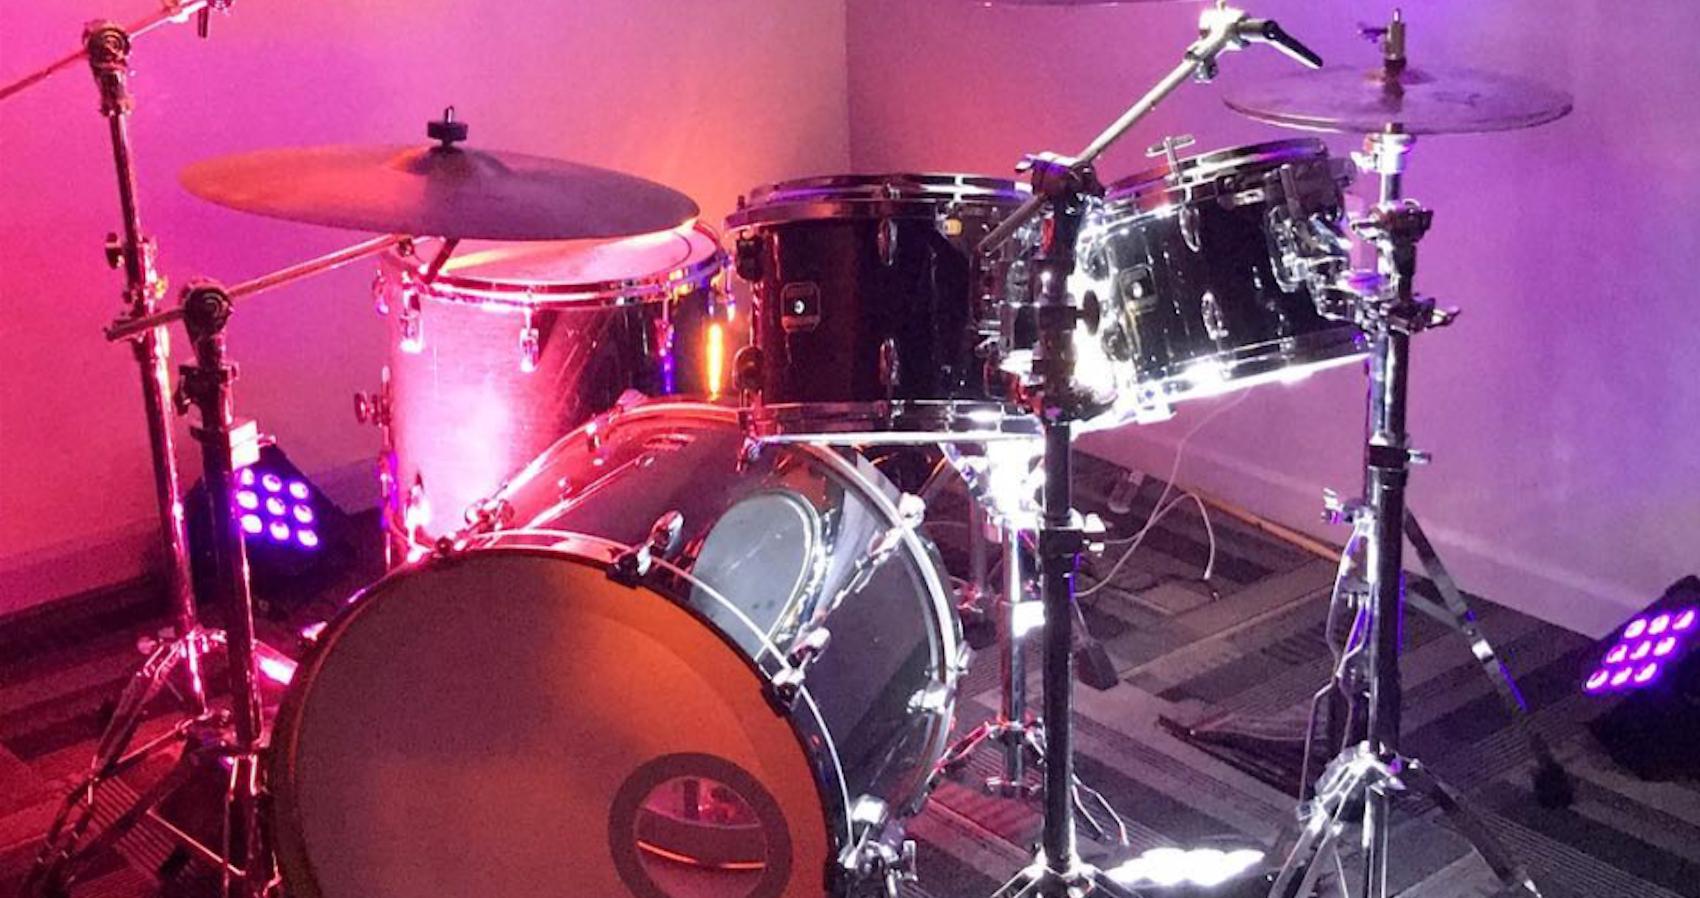 Drum Kit with lighting